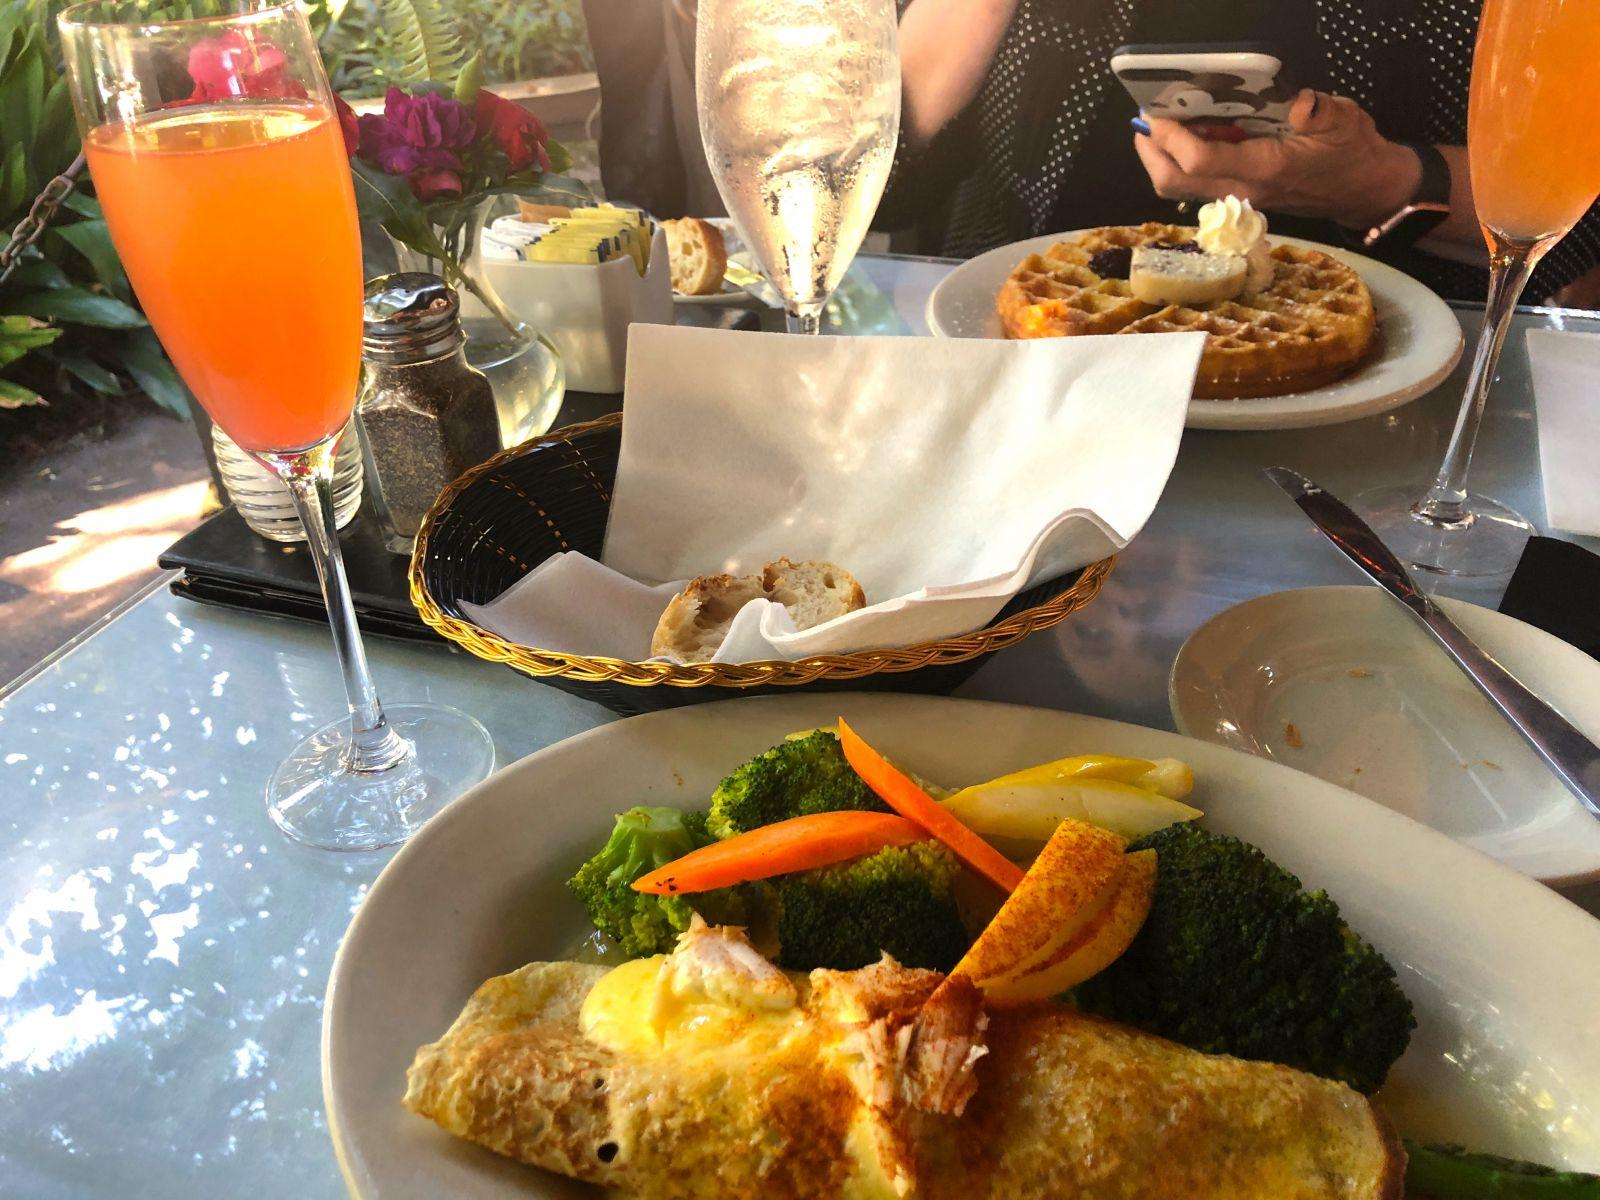 Cafe Degas Our Impression Neworleansrestaurants Com